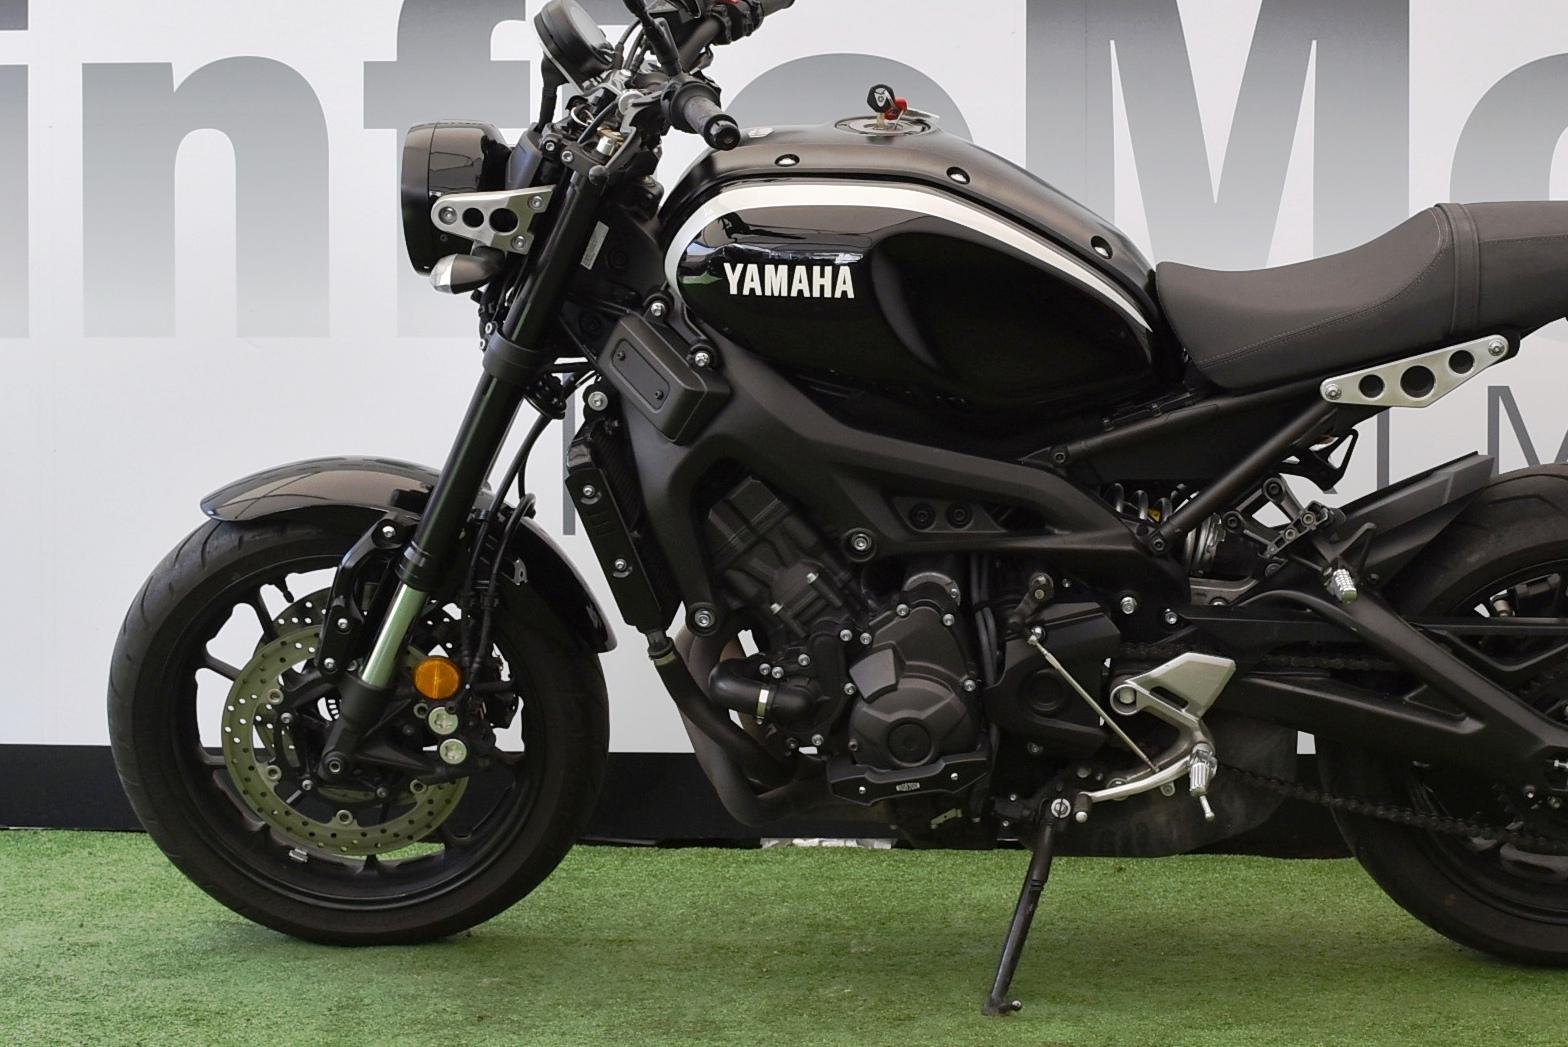 YAMAHA XSR 900 – 2018